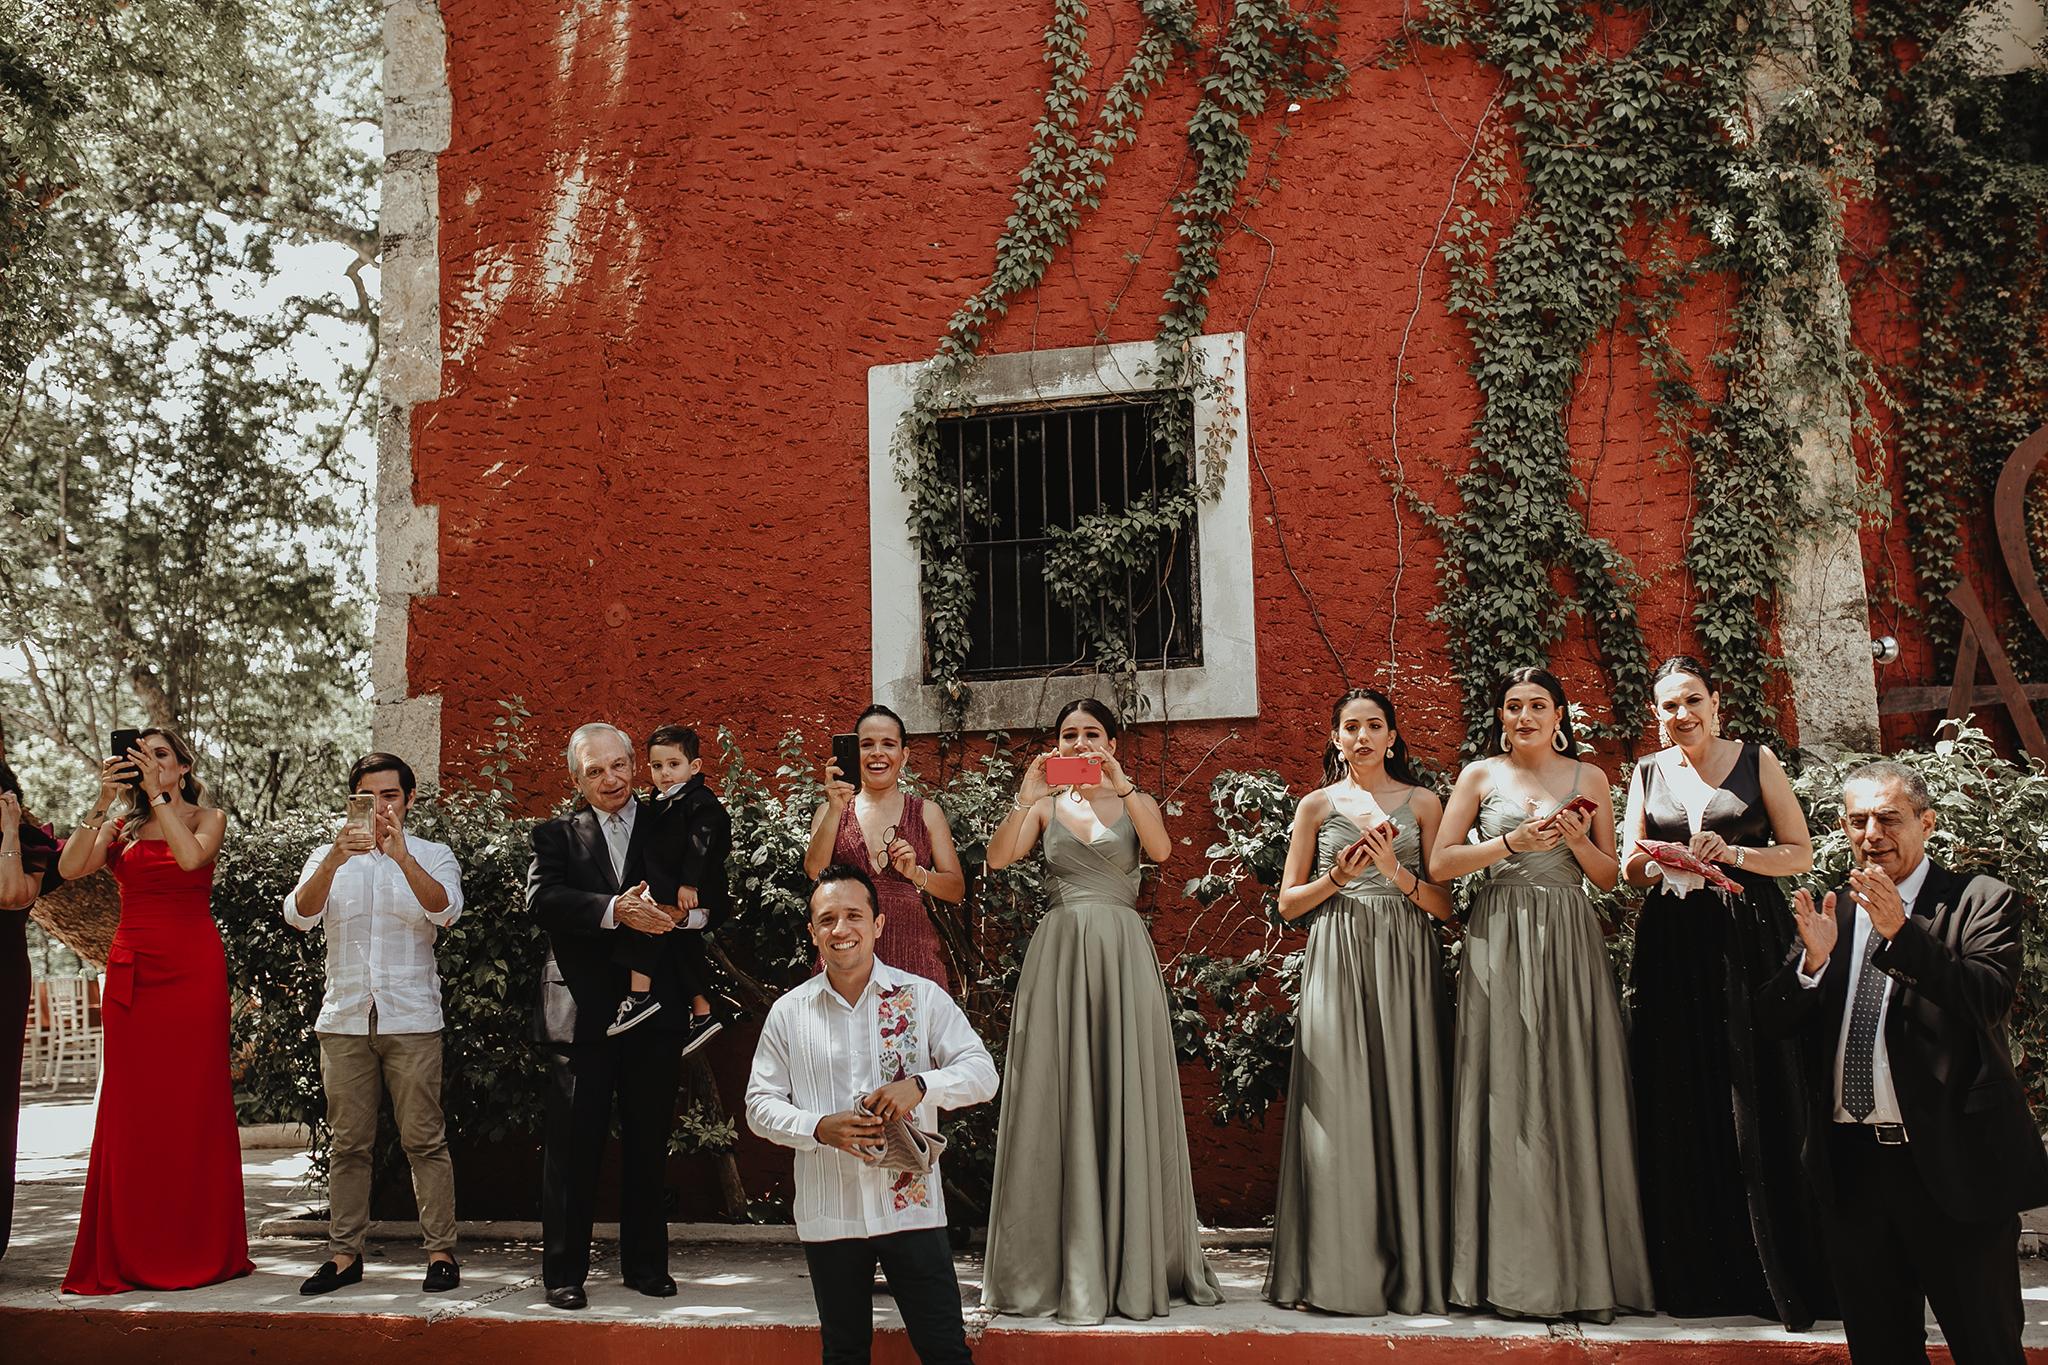 0295R&F__WeddingDestination_Weddingmerida_BodaMexico_FotografoDeBodas_FabrizioSimoneenFotografo.jpg